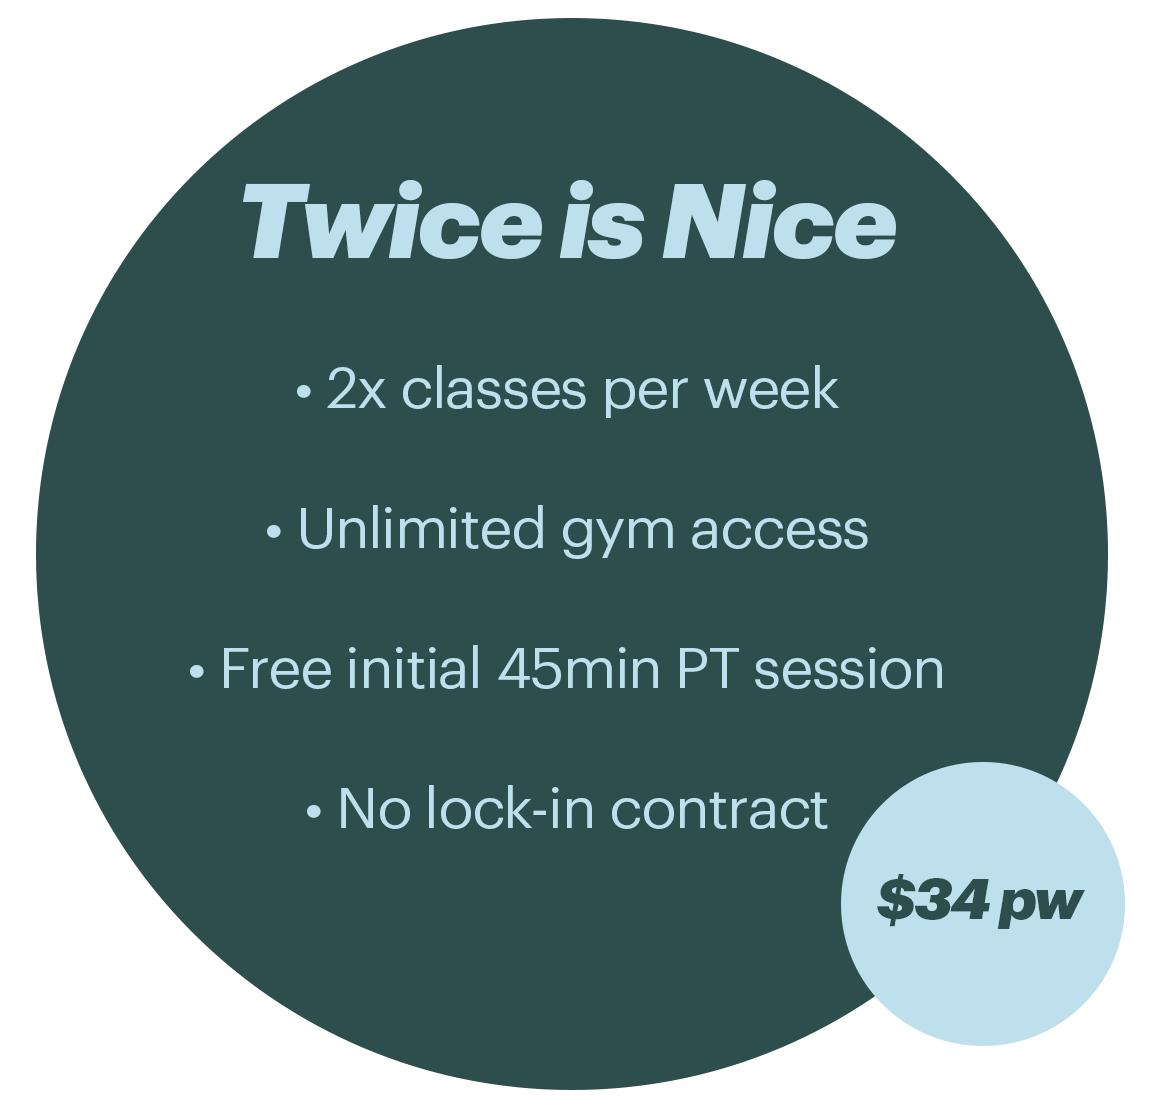 twice is nice gym membership.png